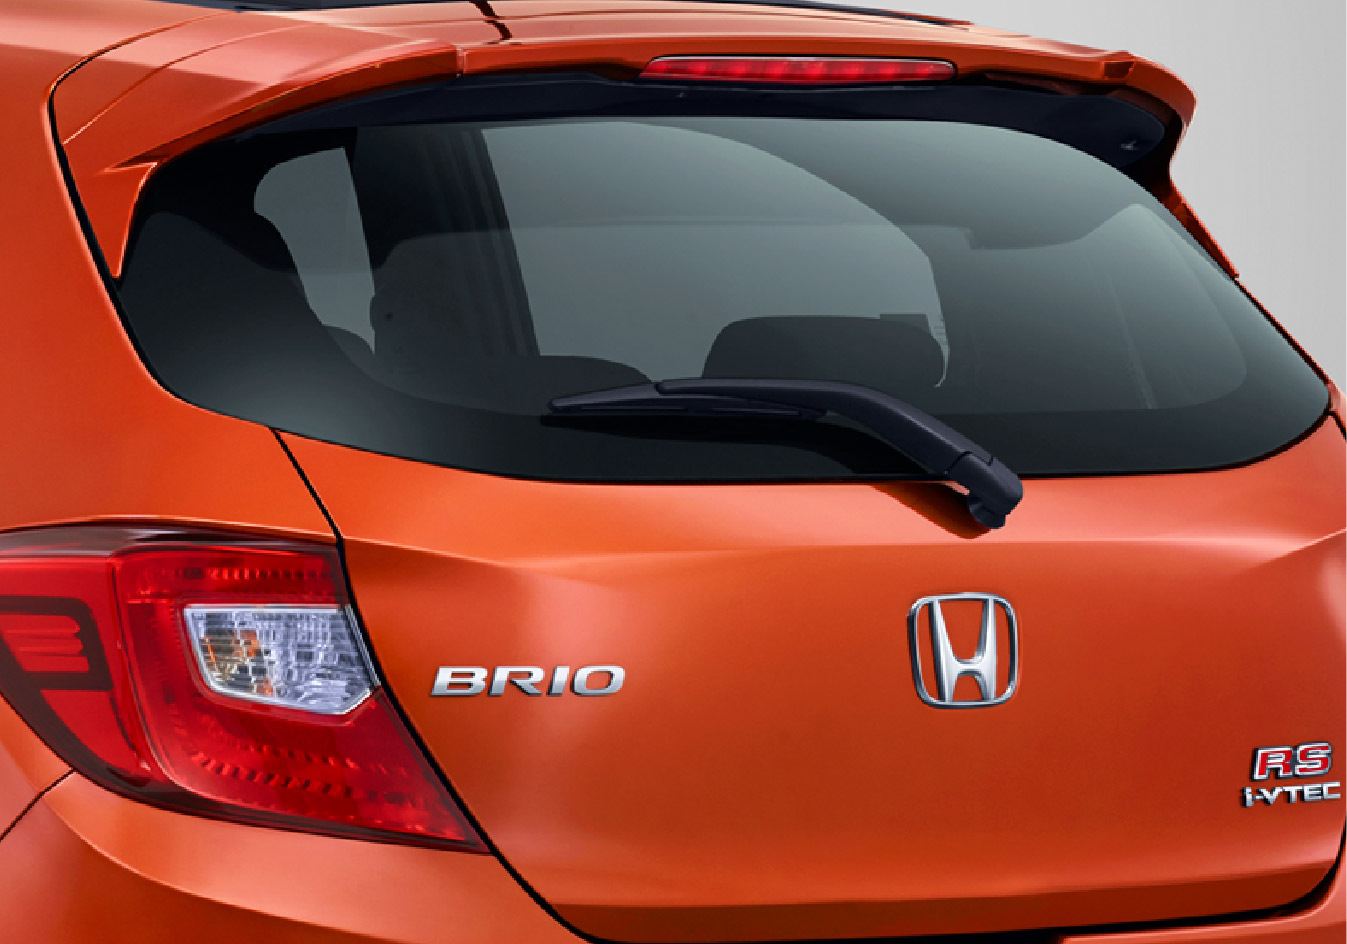 New Honda Brio 4